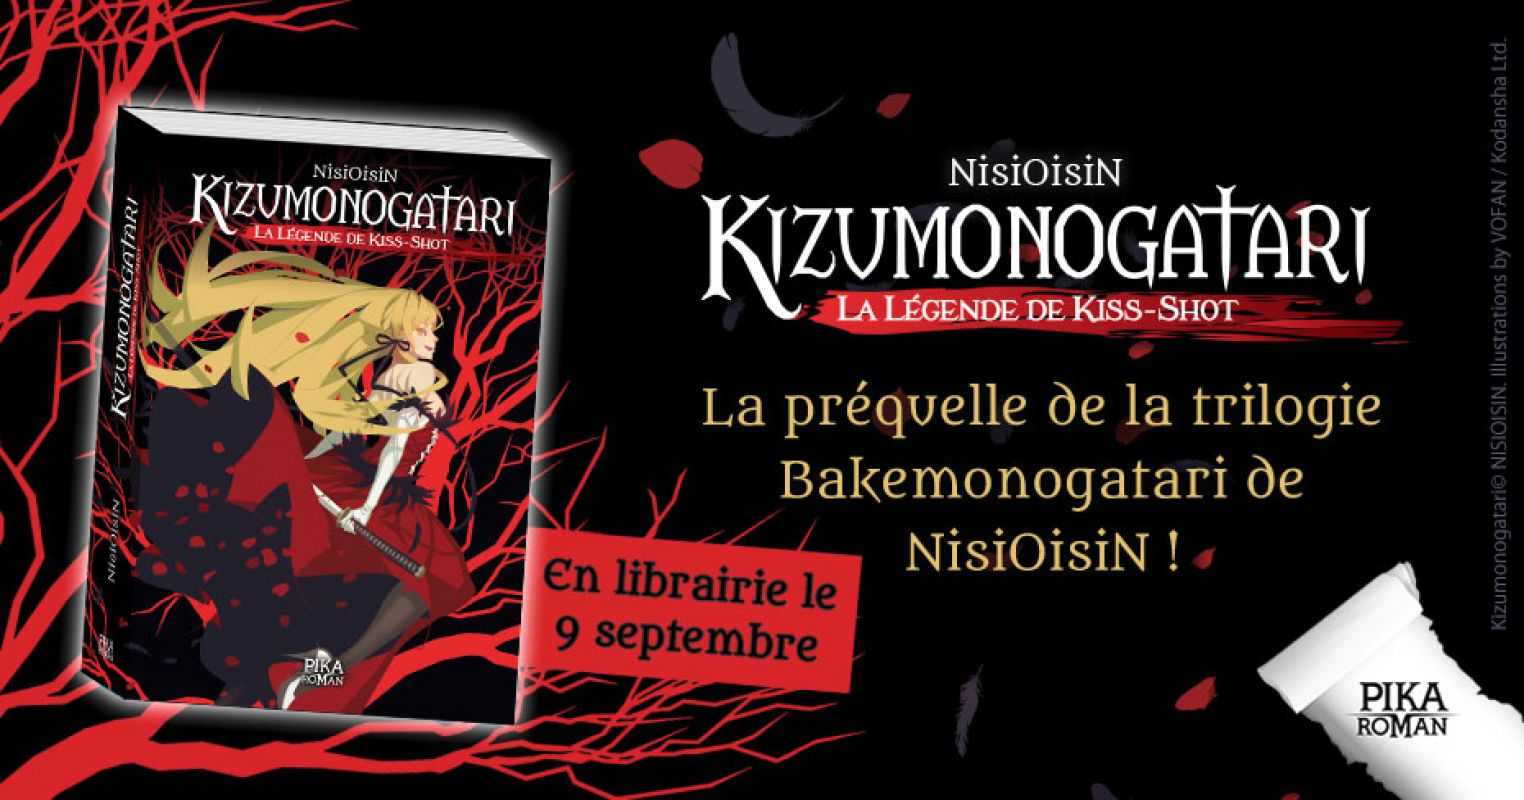 Le roman Kizumonogatari - La Légende de Kiss-Shot chez Pika